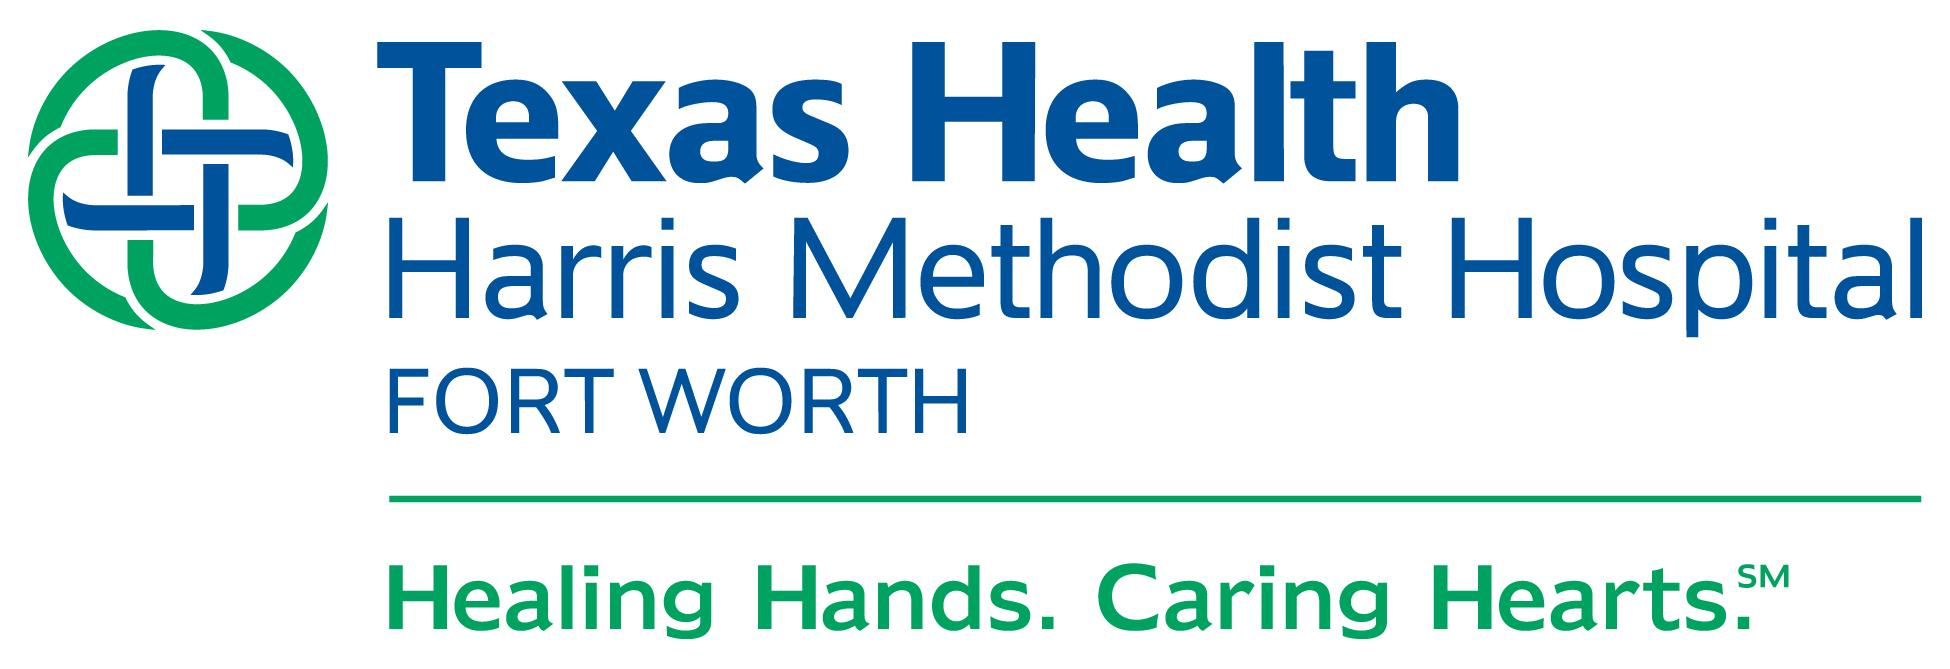 Inpatient Gastroenterology Opportunity in Fort Worth, TX